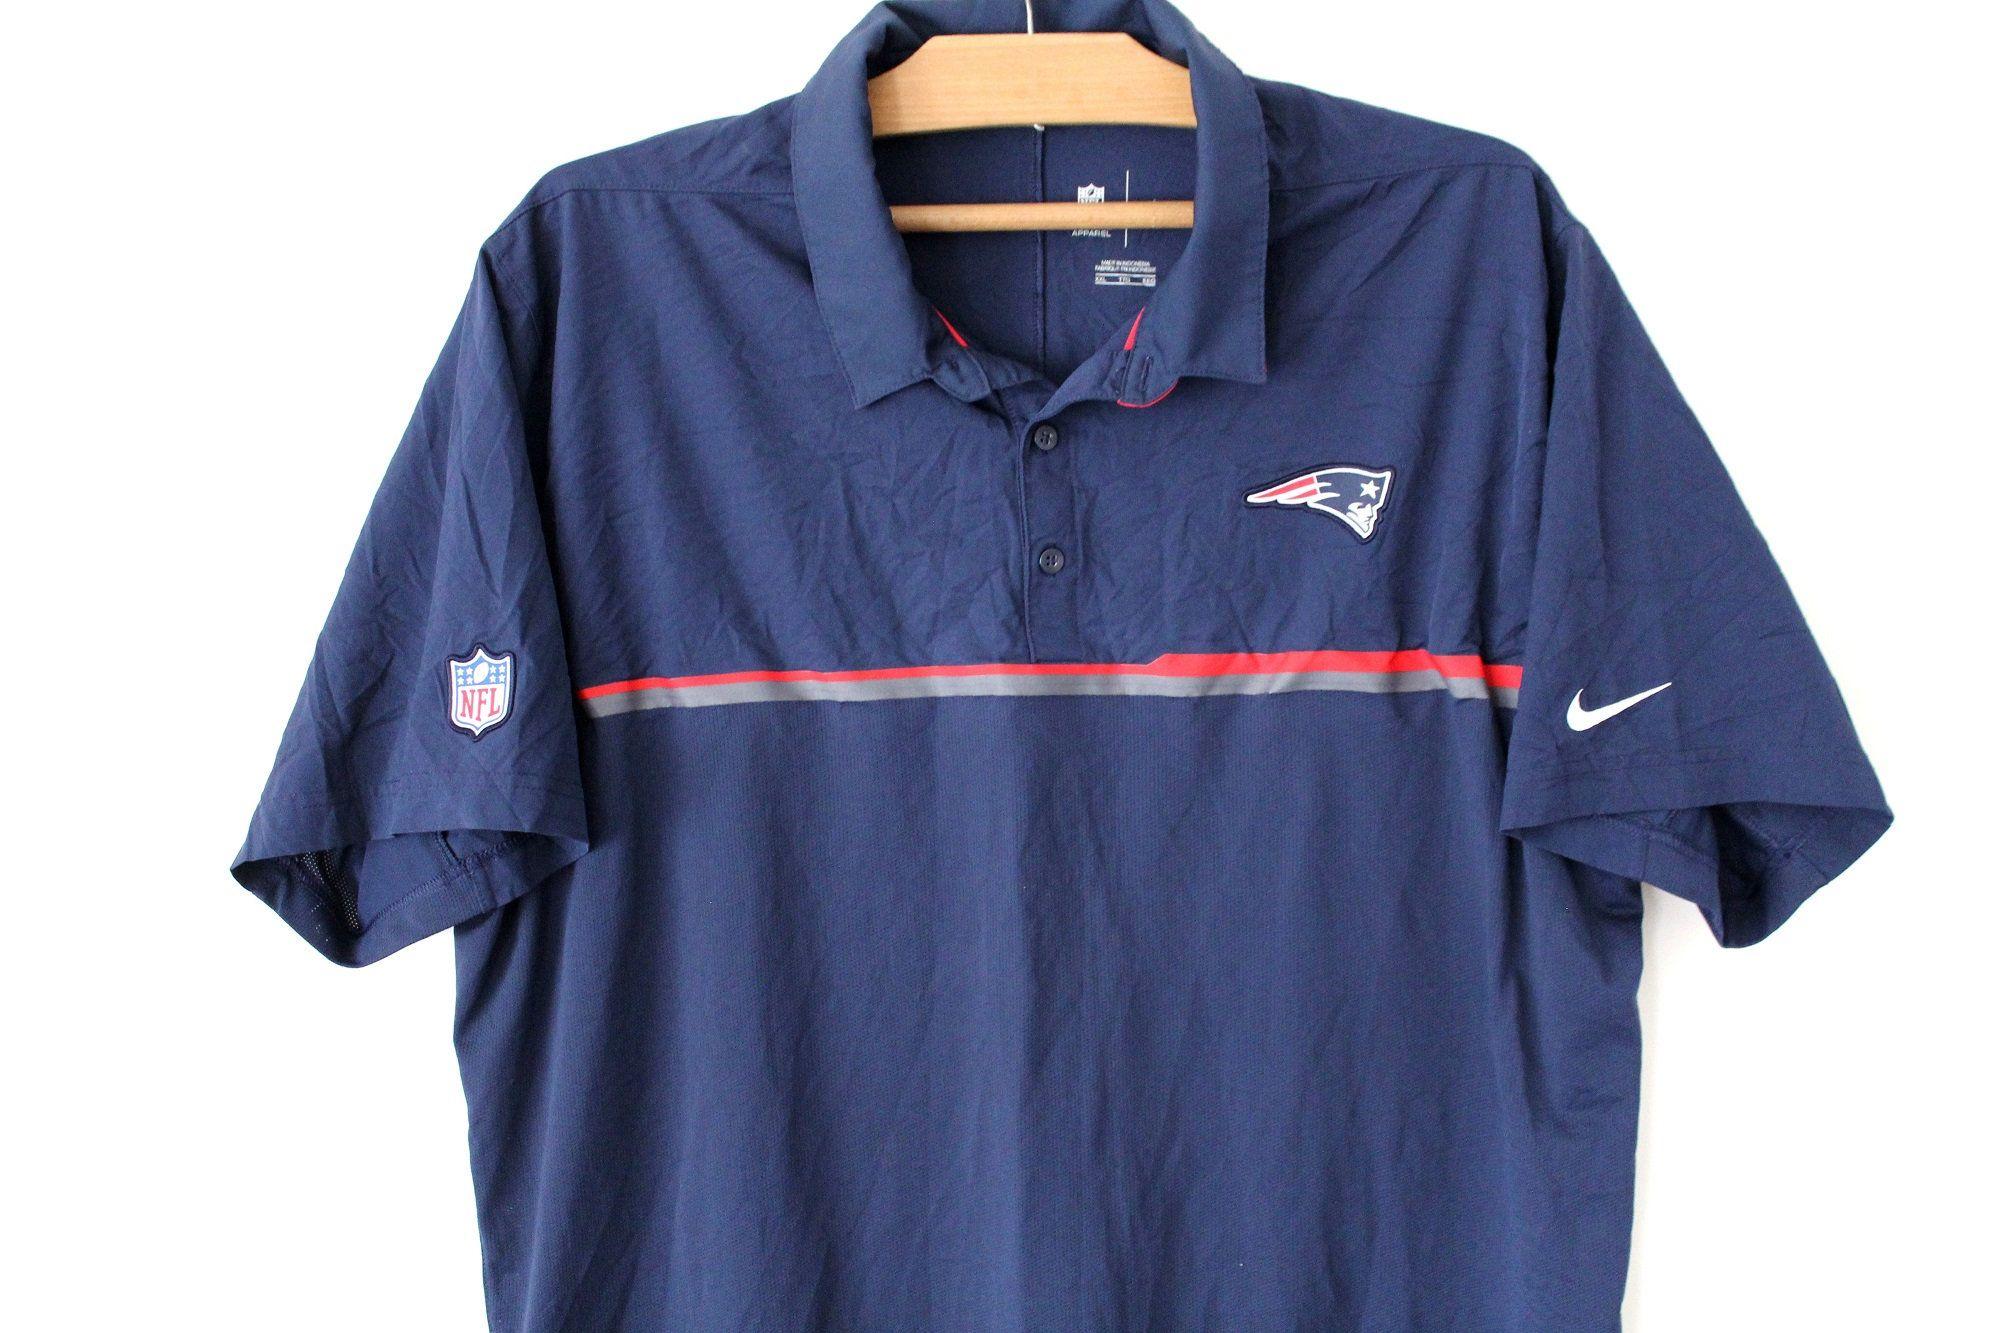 Vintage Nike Shirt Nfl New England Patriots Shirt Blue Collard Football T Shirt Sportswear Activewear Training Shirt Size Xxl In 2020 Football Tshirts Training Shirts Patriotic Shirts